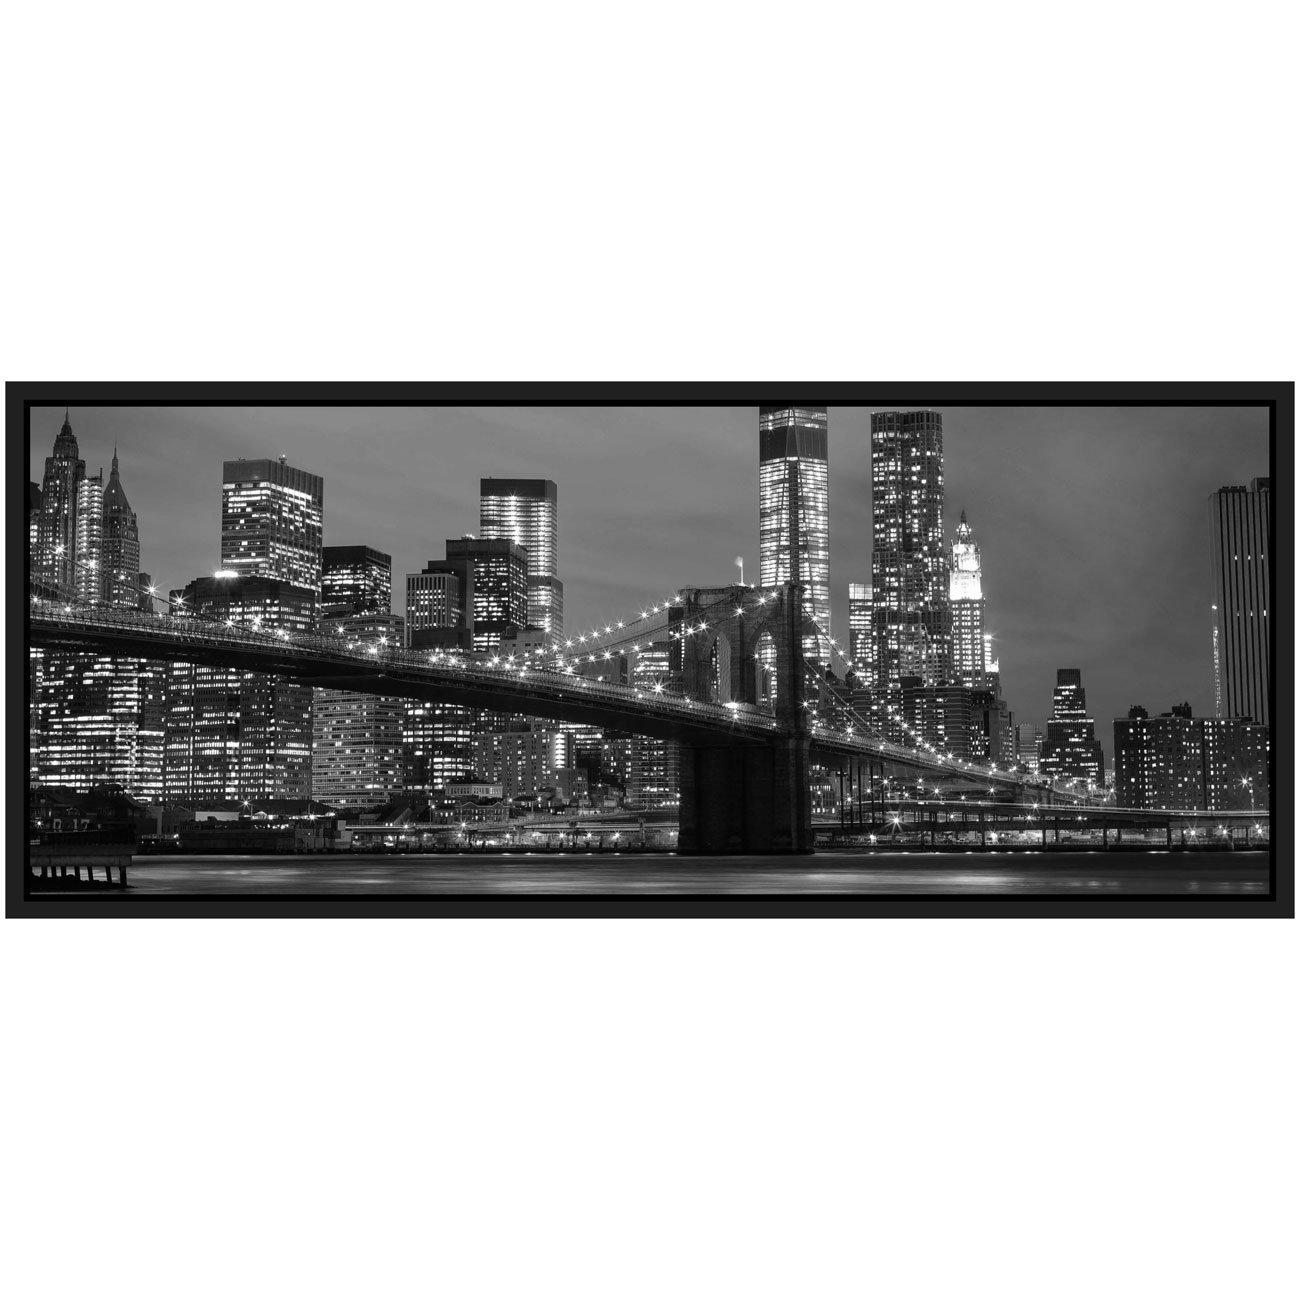 Quadro Panorâmico Ponte Brooklyn New York 120x50cm Preto e Branco